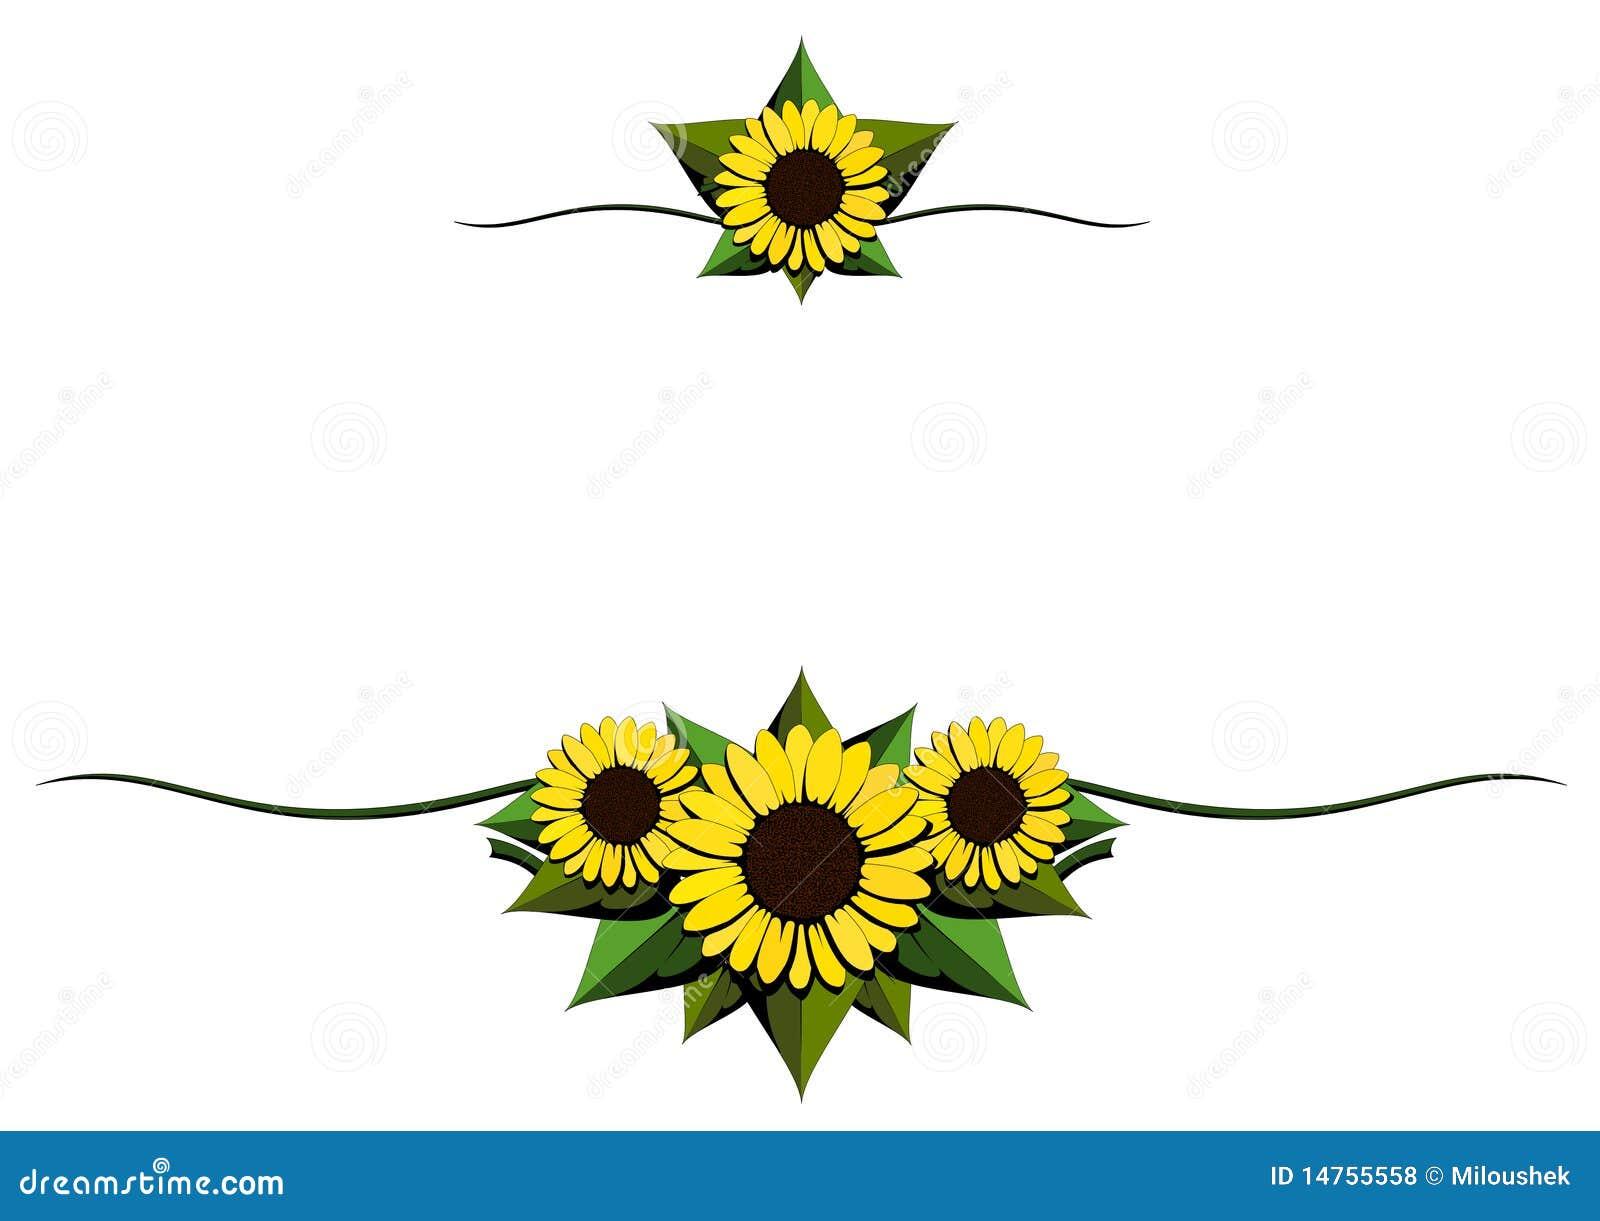 Sunflower Cartoon Background Stock Illustration Illustration Of